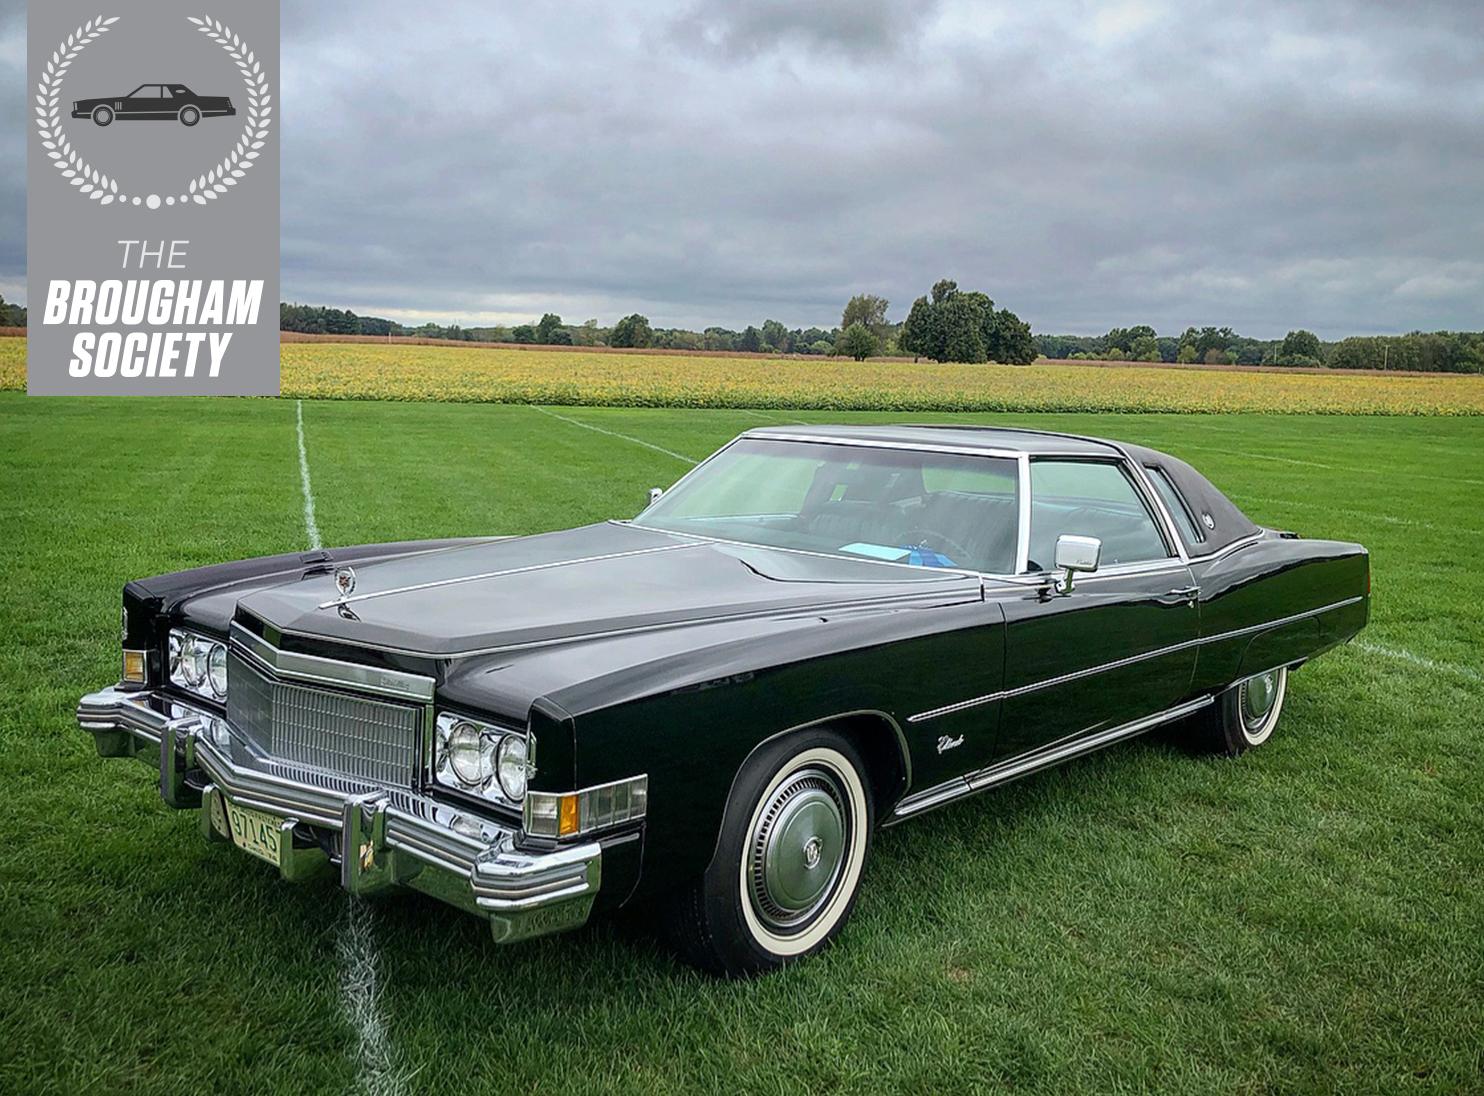 The 1974 Cadillac Eldorado was Superfly all day thumbnail